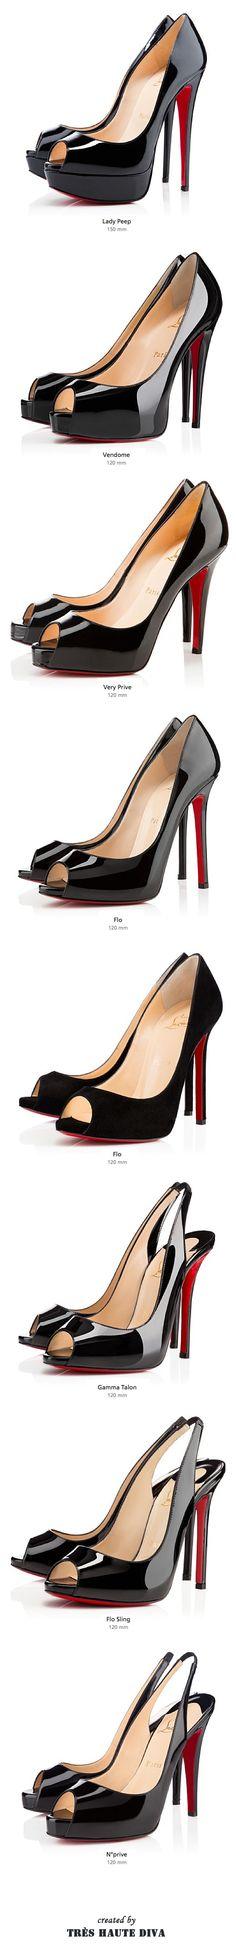 Cheap Red Bottom. Women's Fashion Dream Heels. #christianlouboutin #Christian…